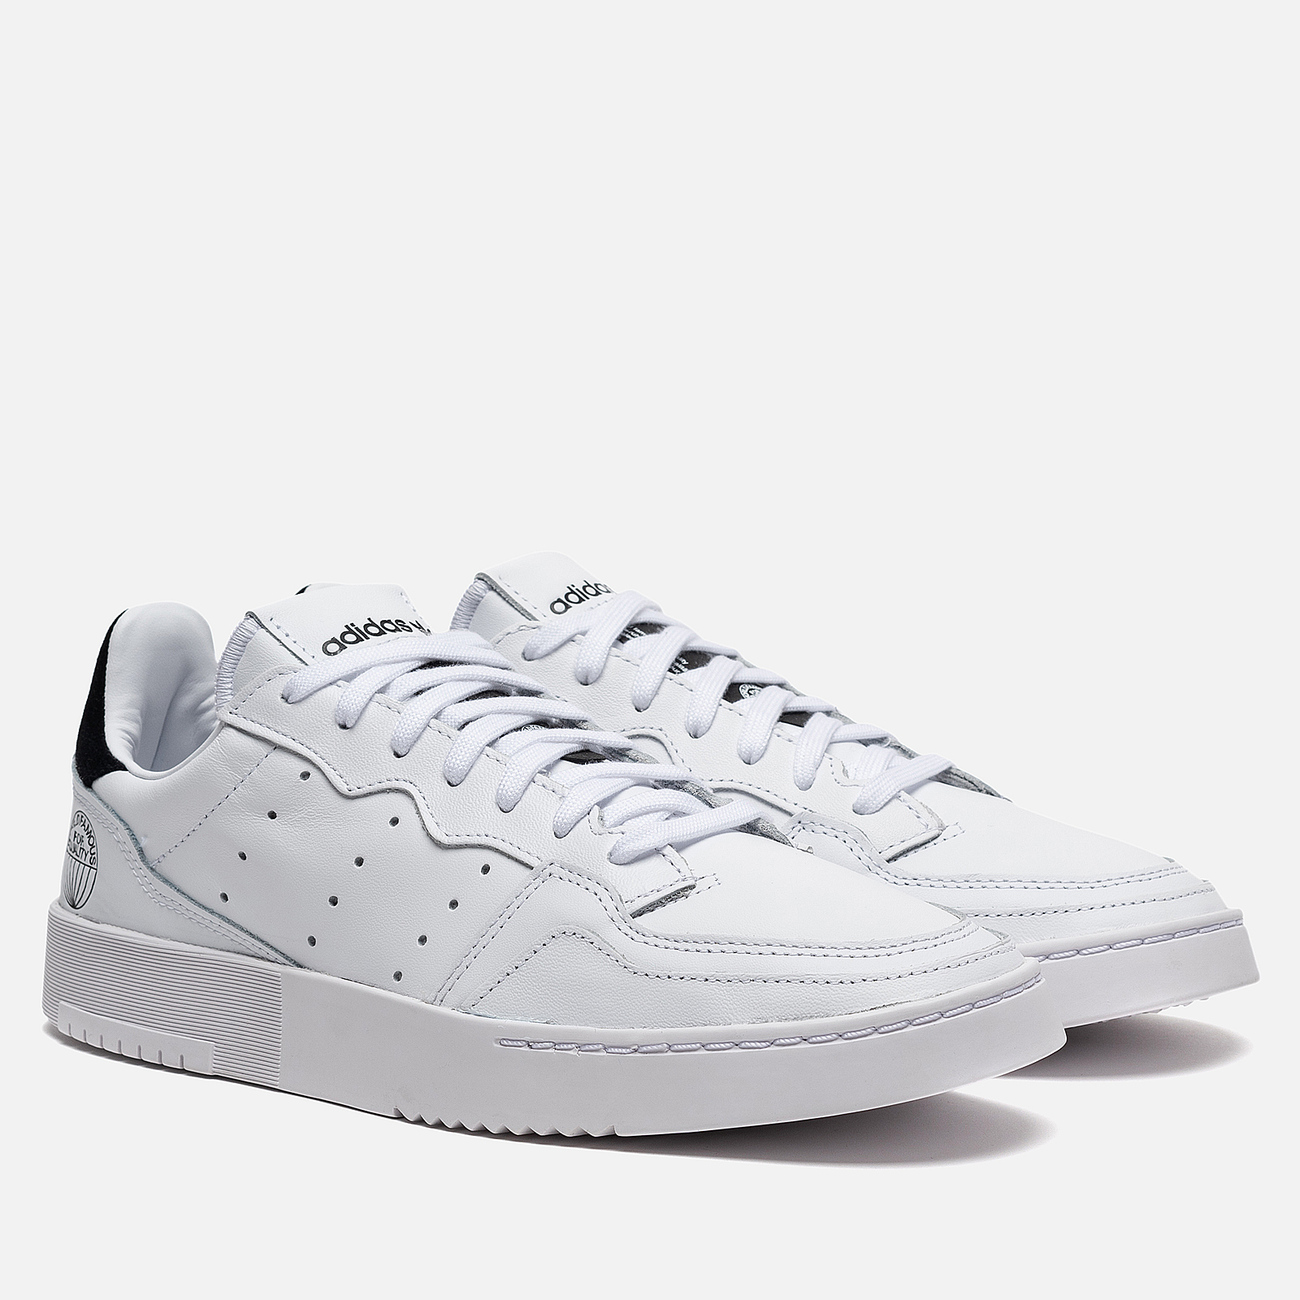 Мужские кроссовки adidas Originals Supercourt Cloud White/Cloud White/Core Black